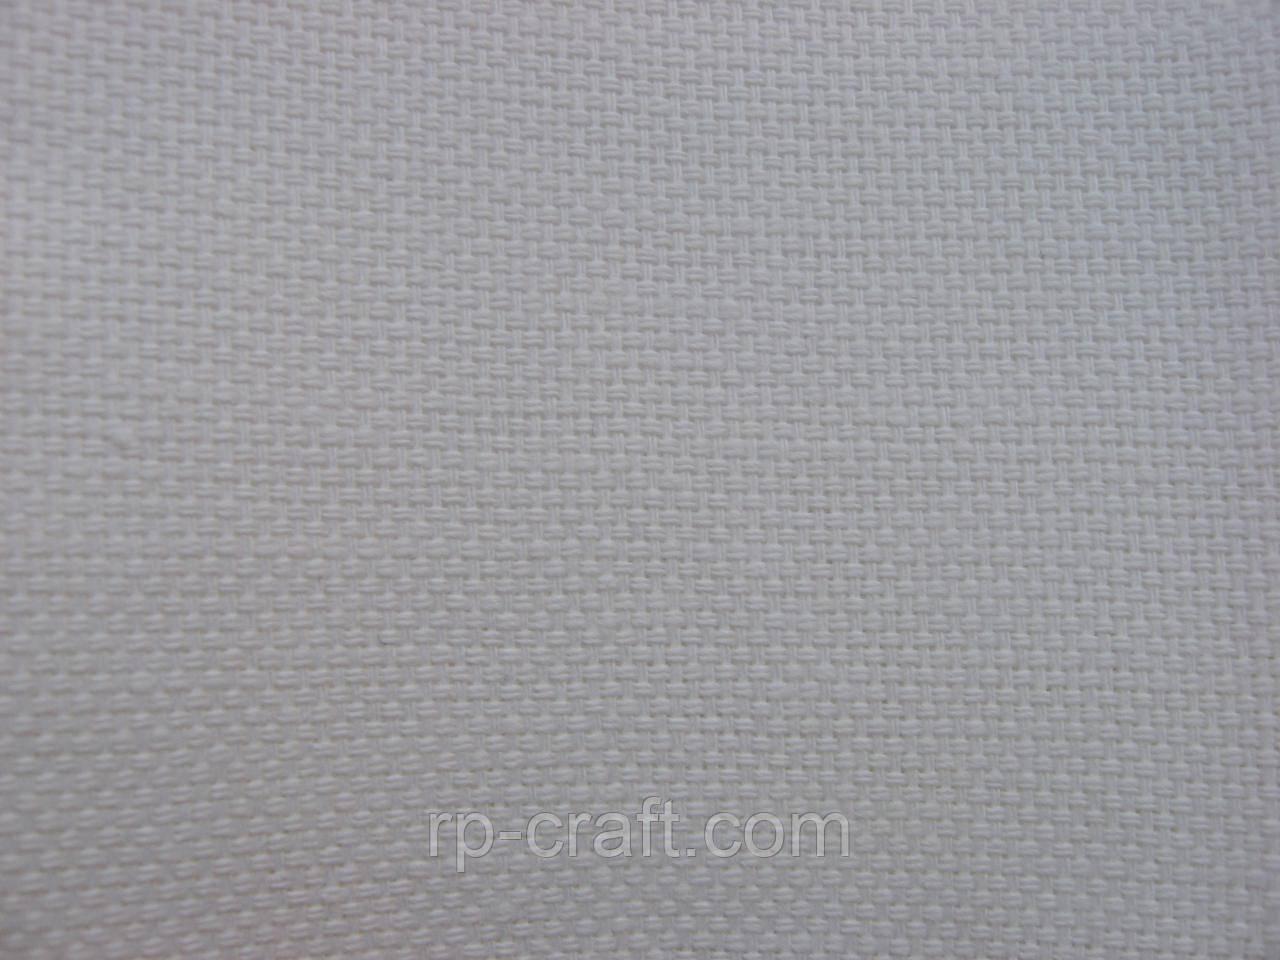 Отрез ткани для вышивки. Харданген, белая, 30х45 см